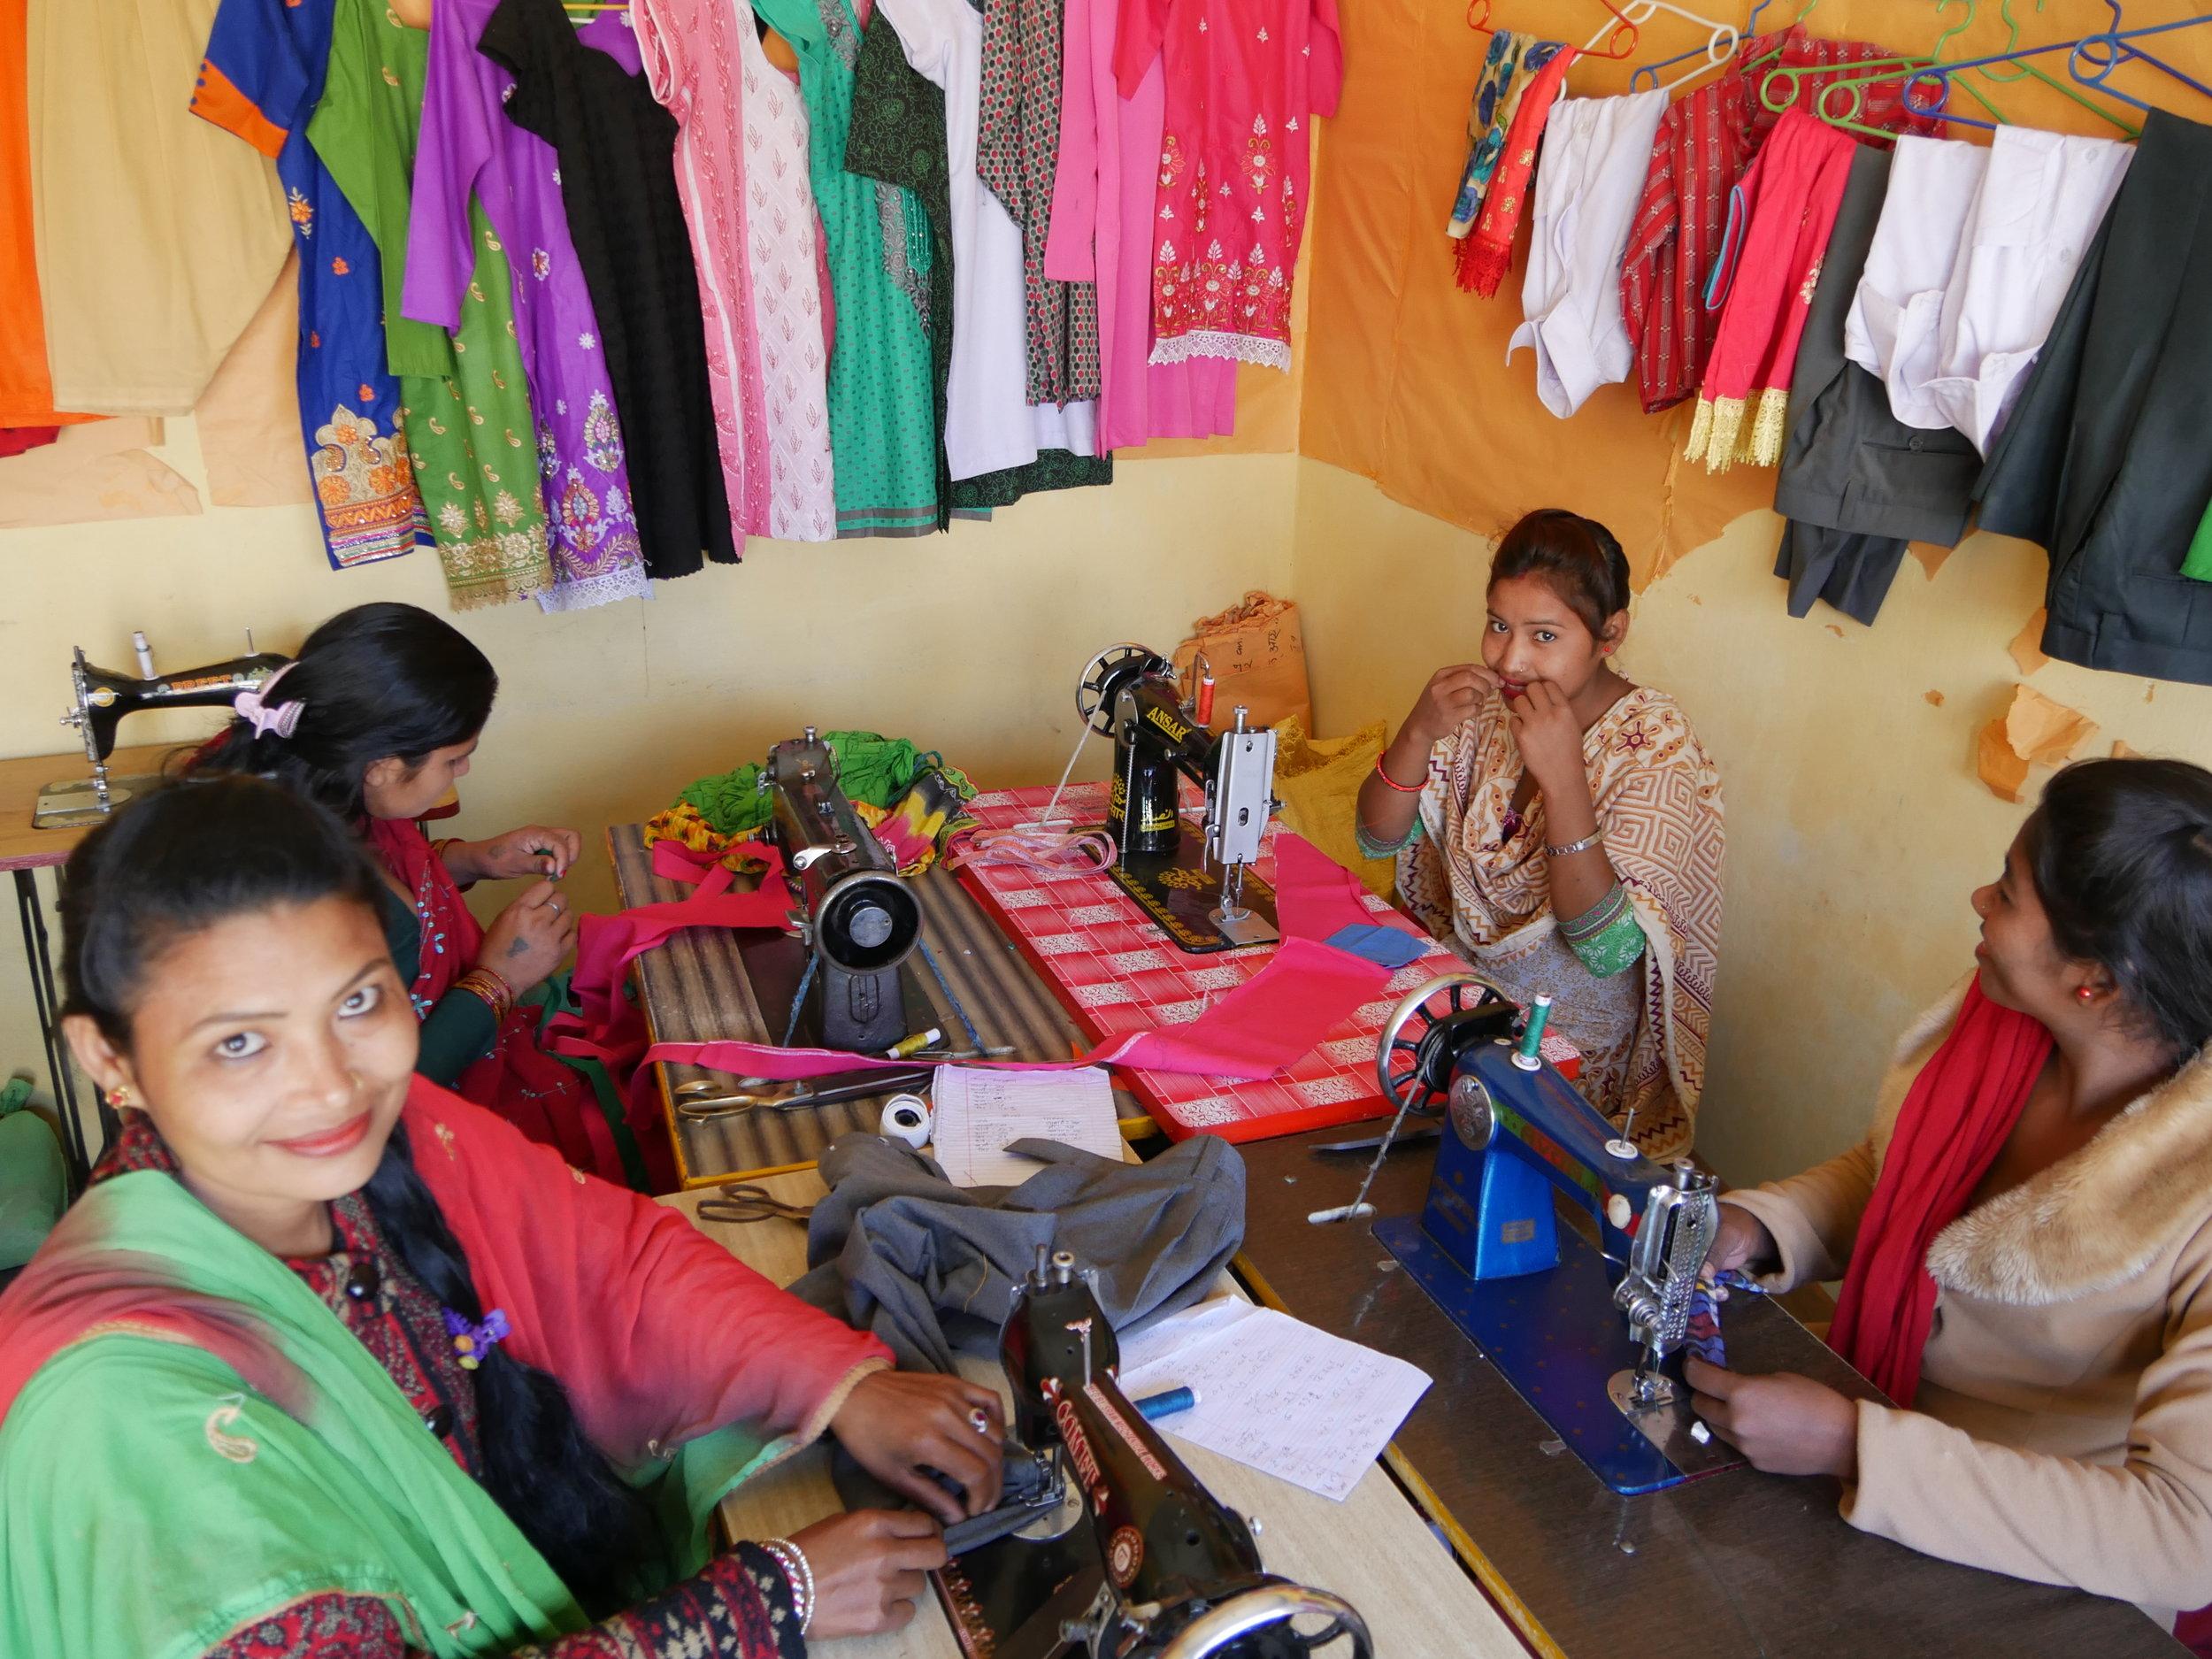 Hari Kumari's and her students hard at work making beautiful and colourful clothing